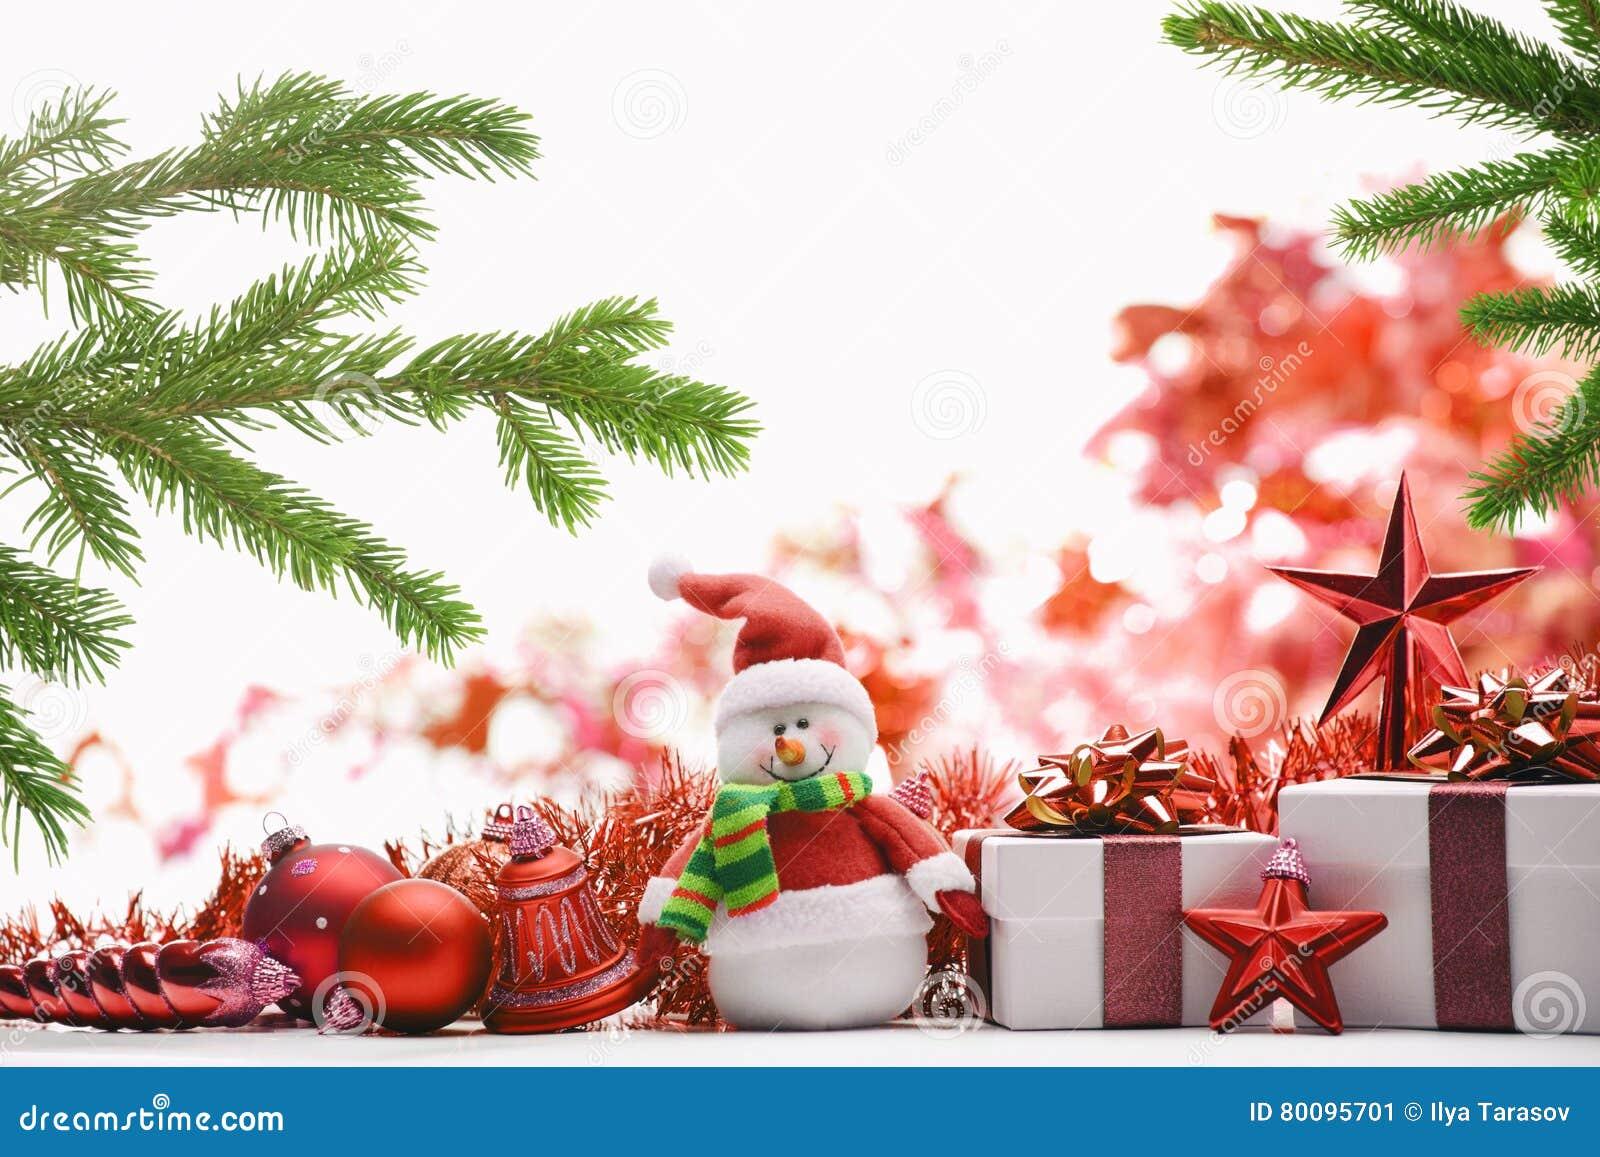 Russian christmas gift box